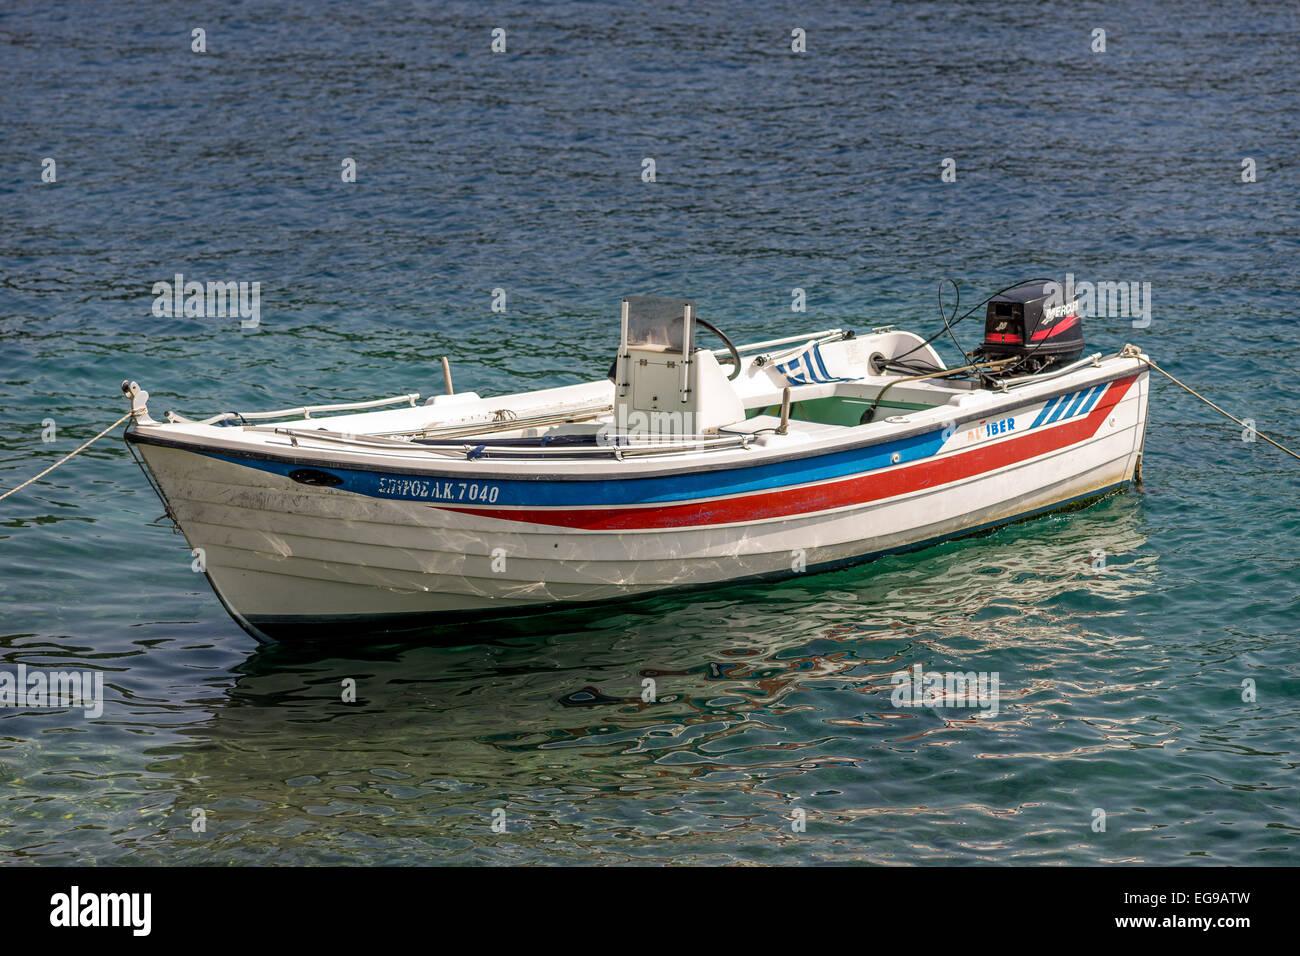 Anchored colorful boat on the sea Corfu island Greece - Stock Image